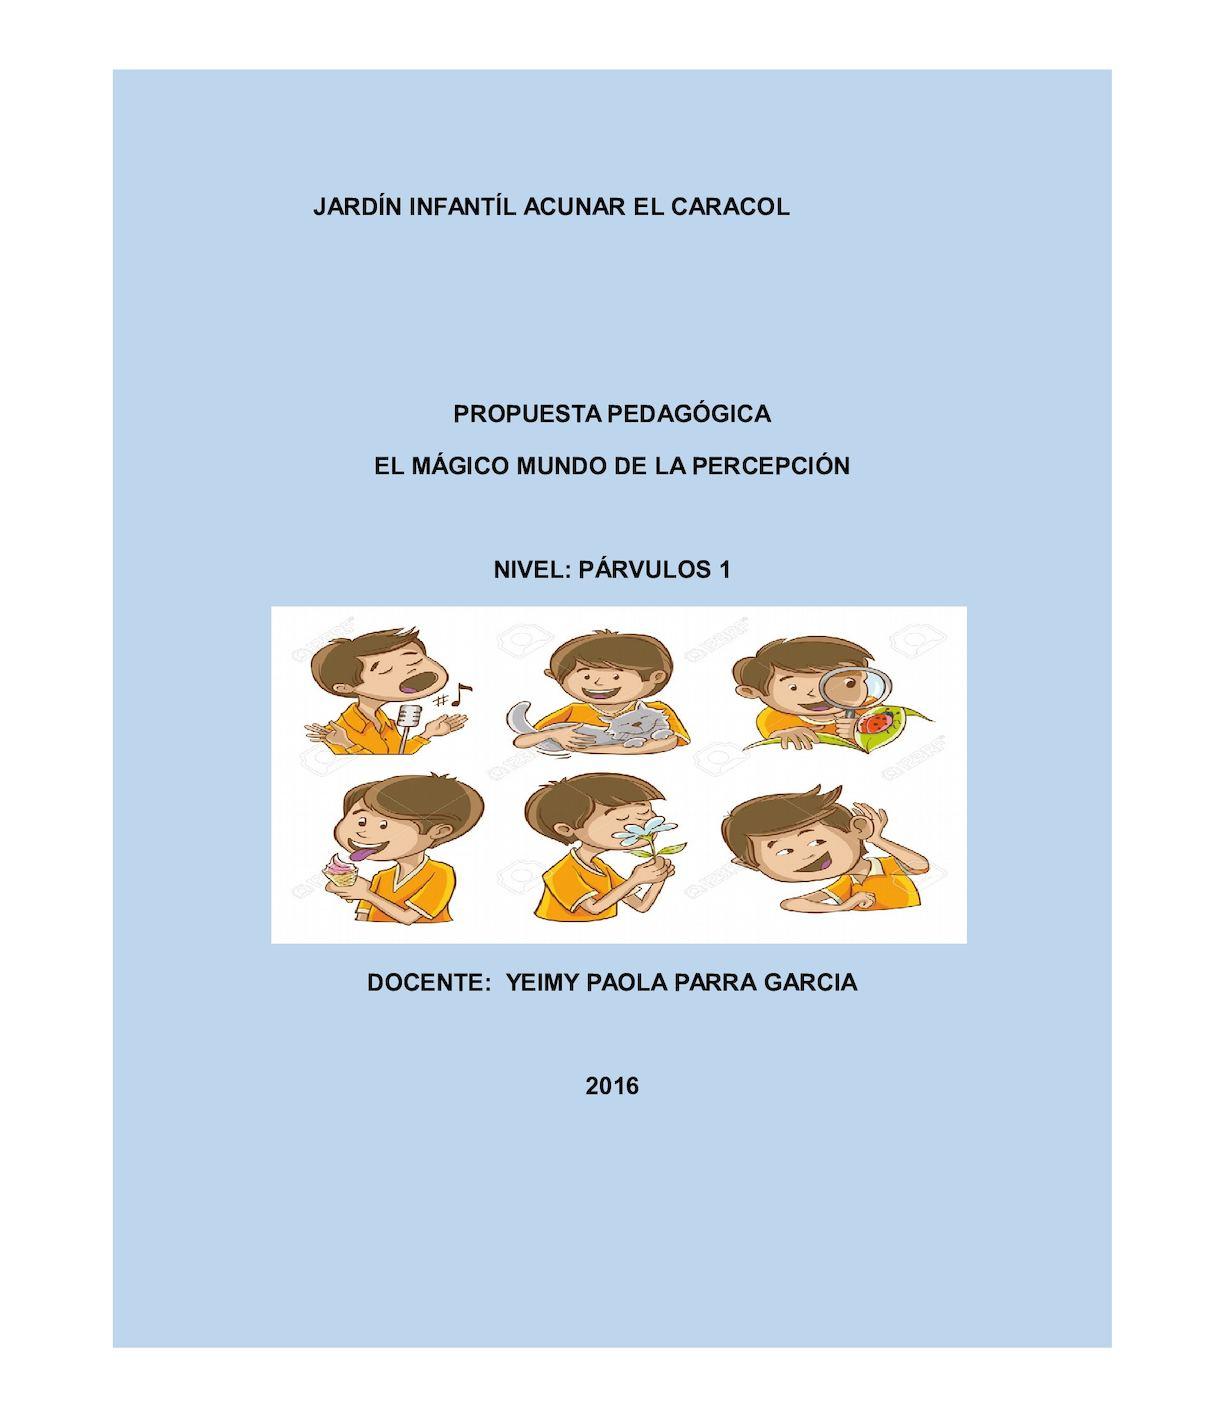 Proyecto Pedagogico 2016